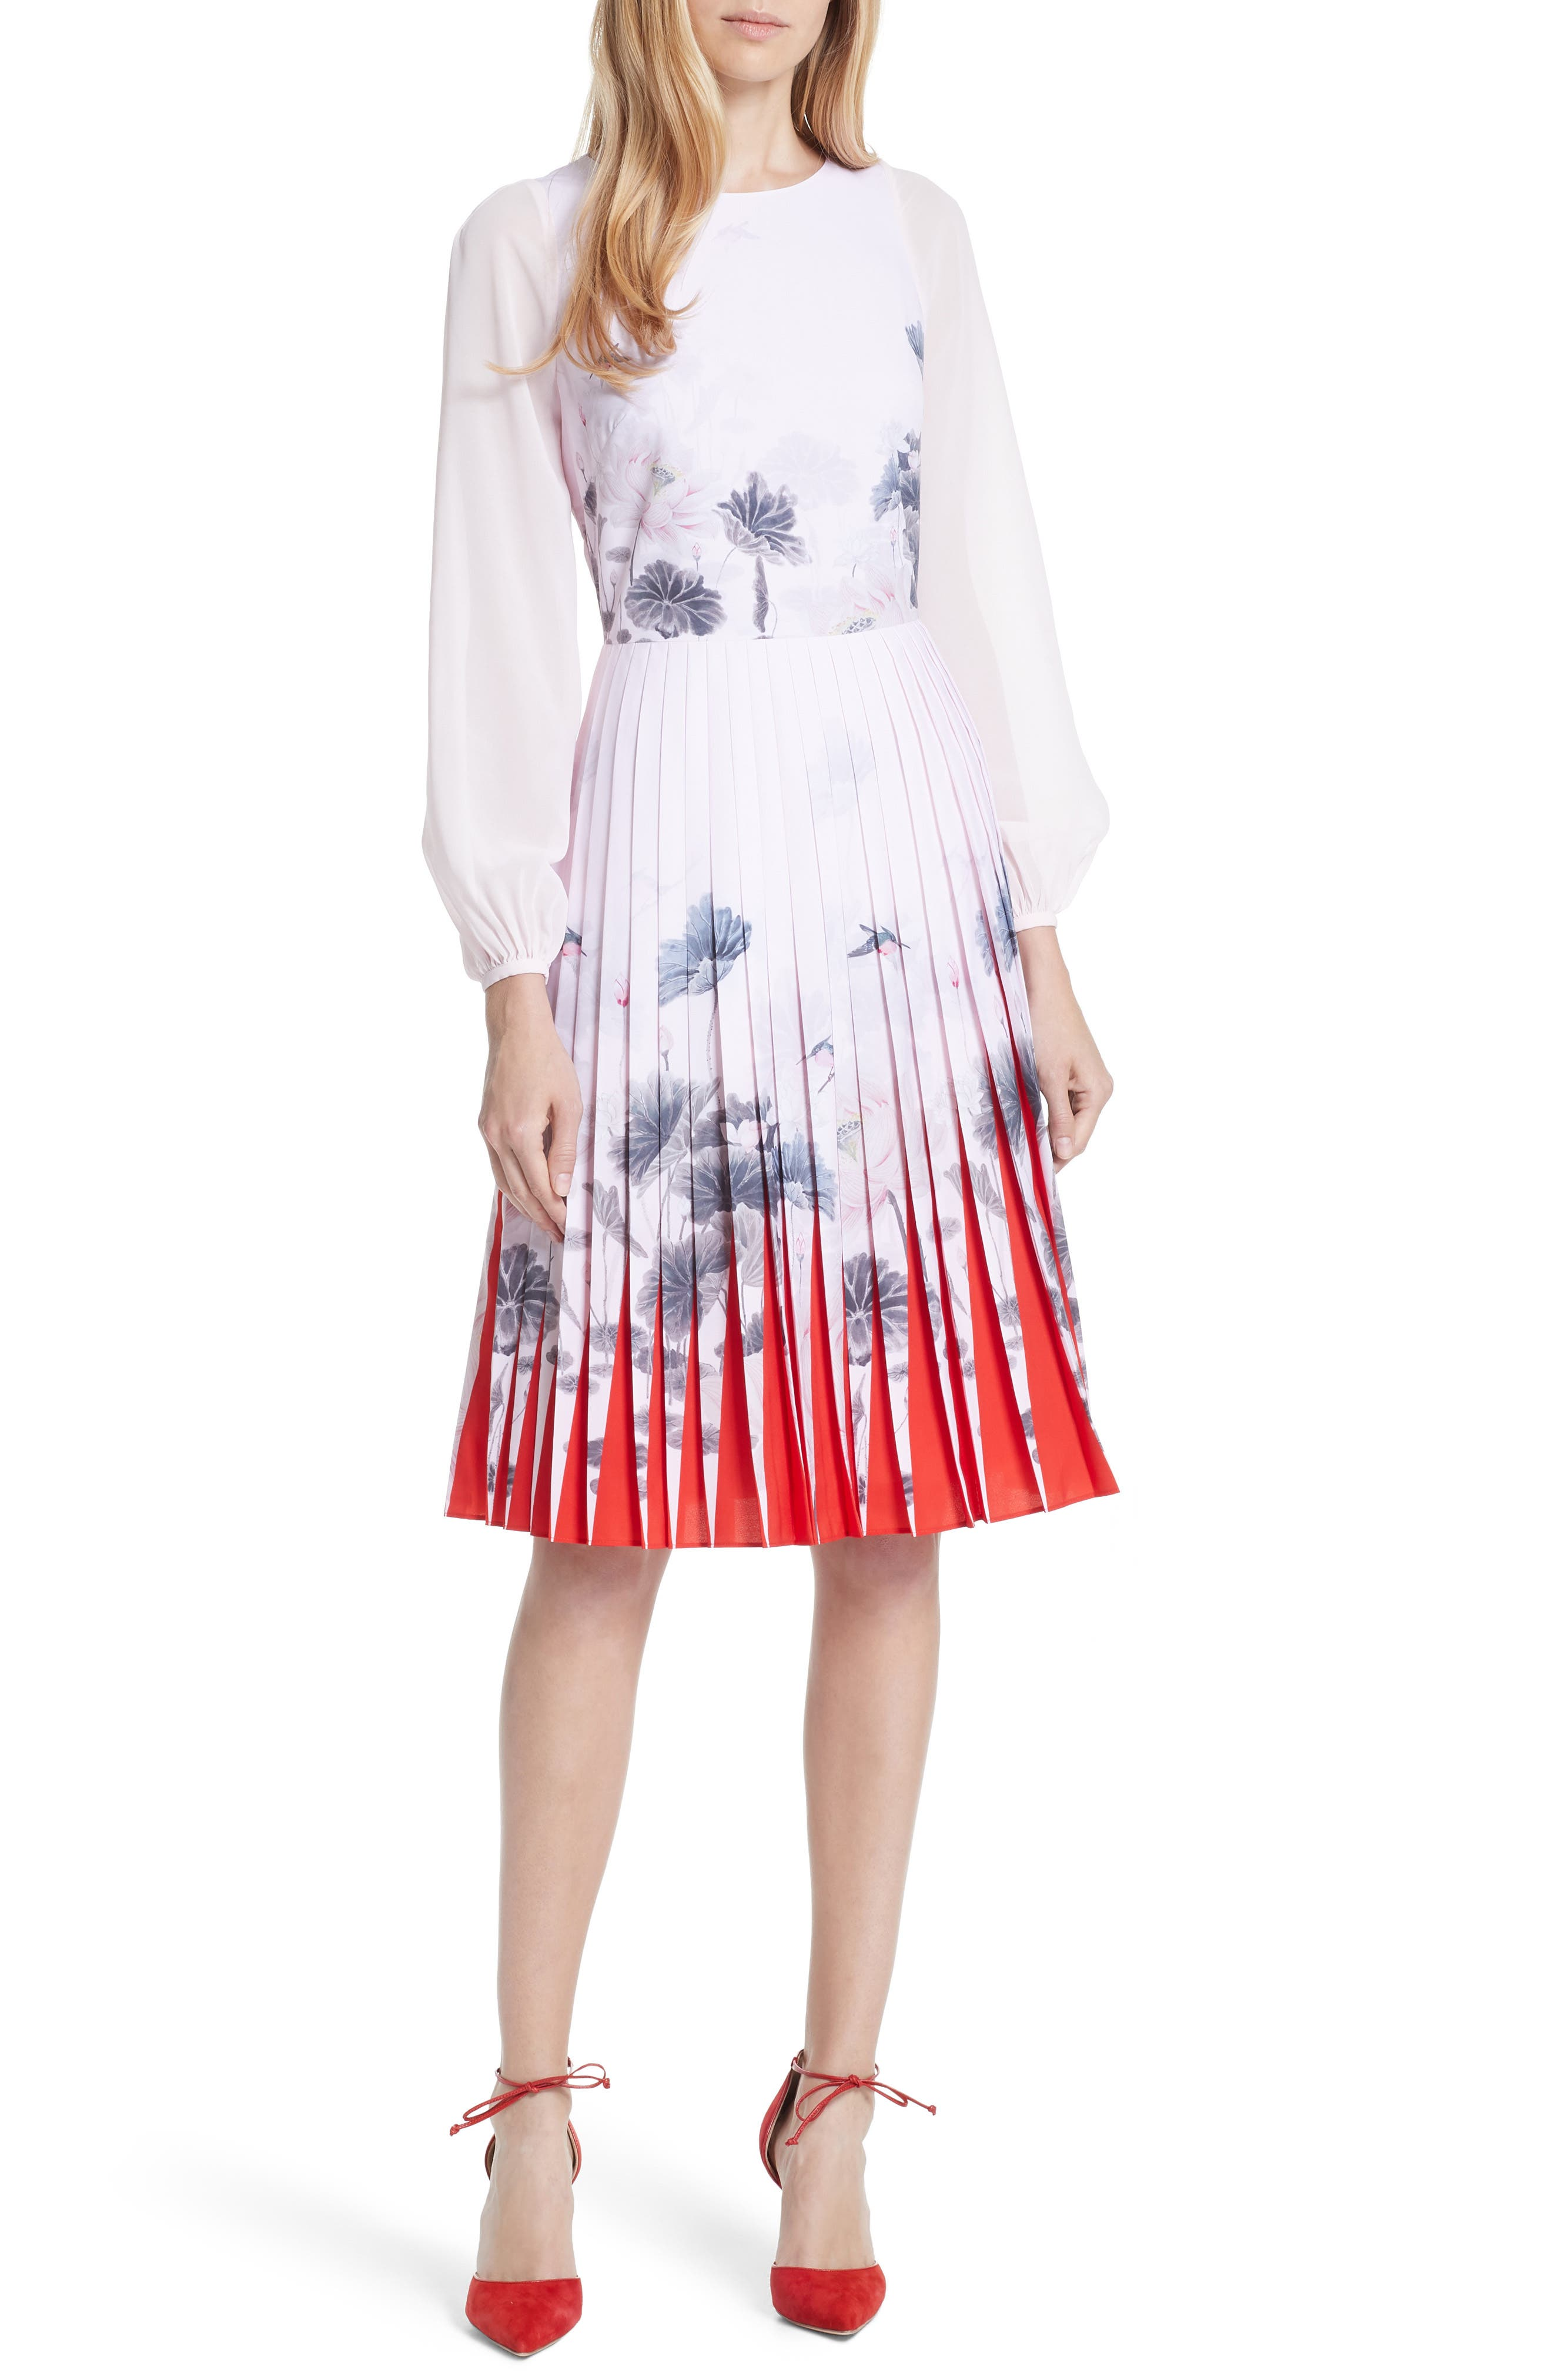 6eb275020 Ted baker london lake of dreams pleated dress nordstrom jpg 1660x2546 Ted  baker lavender dress